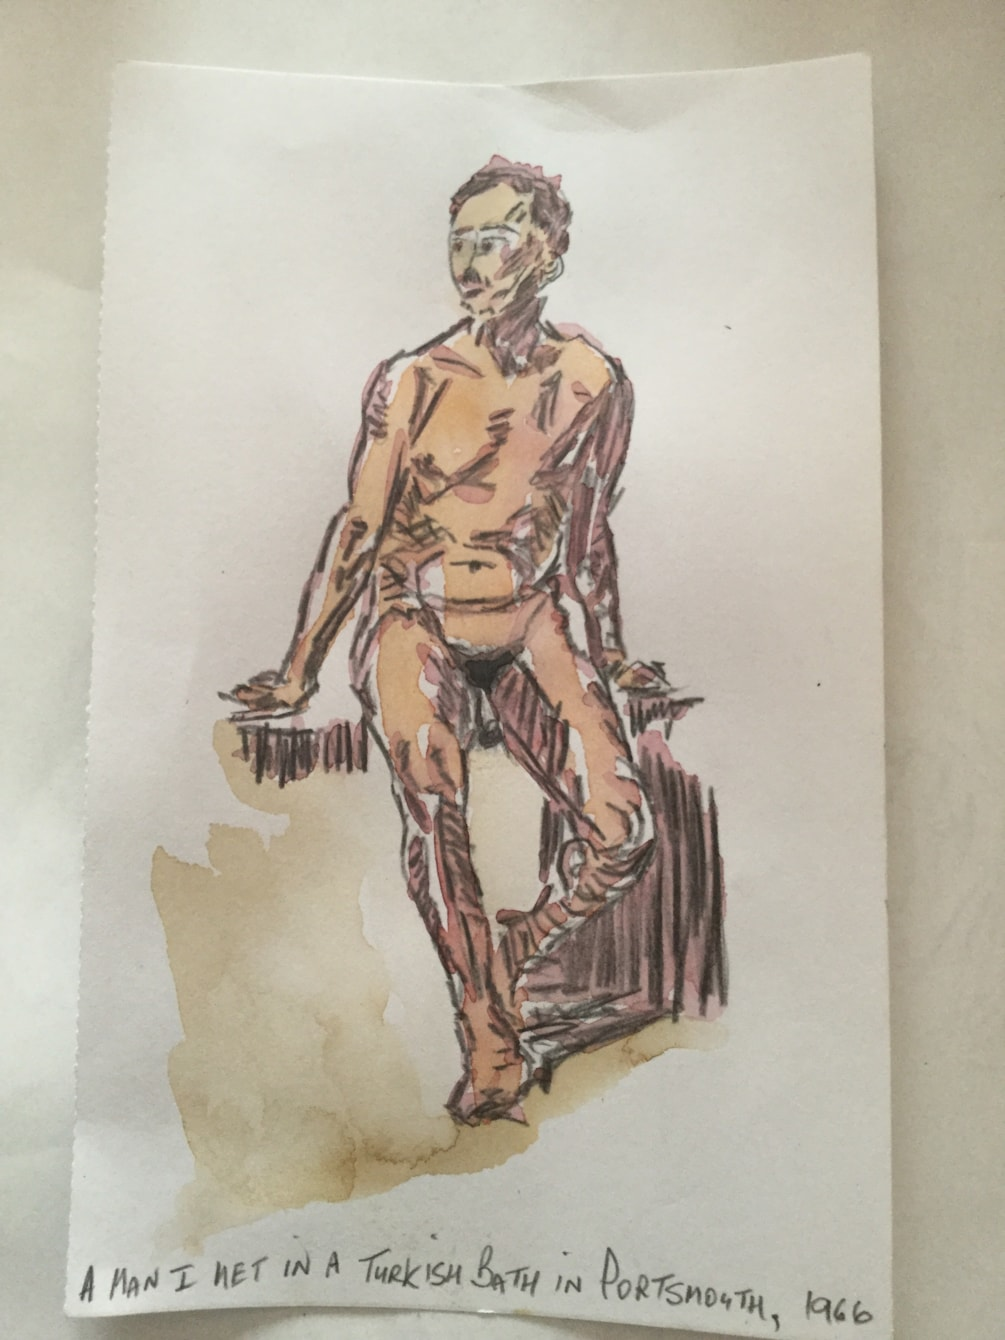 A man I met in a Turkish bath